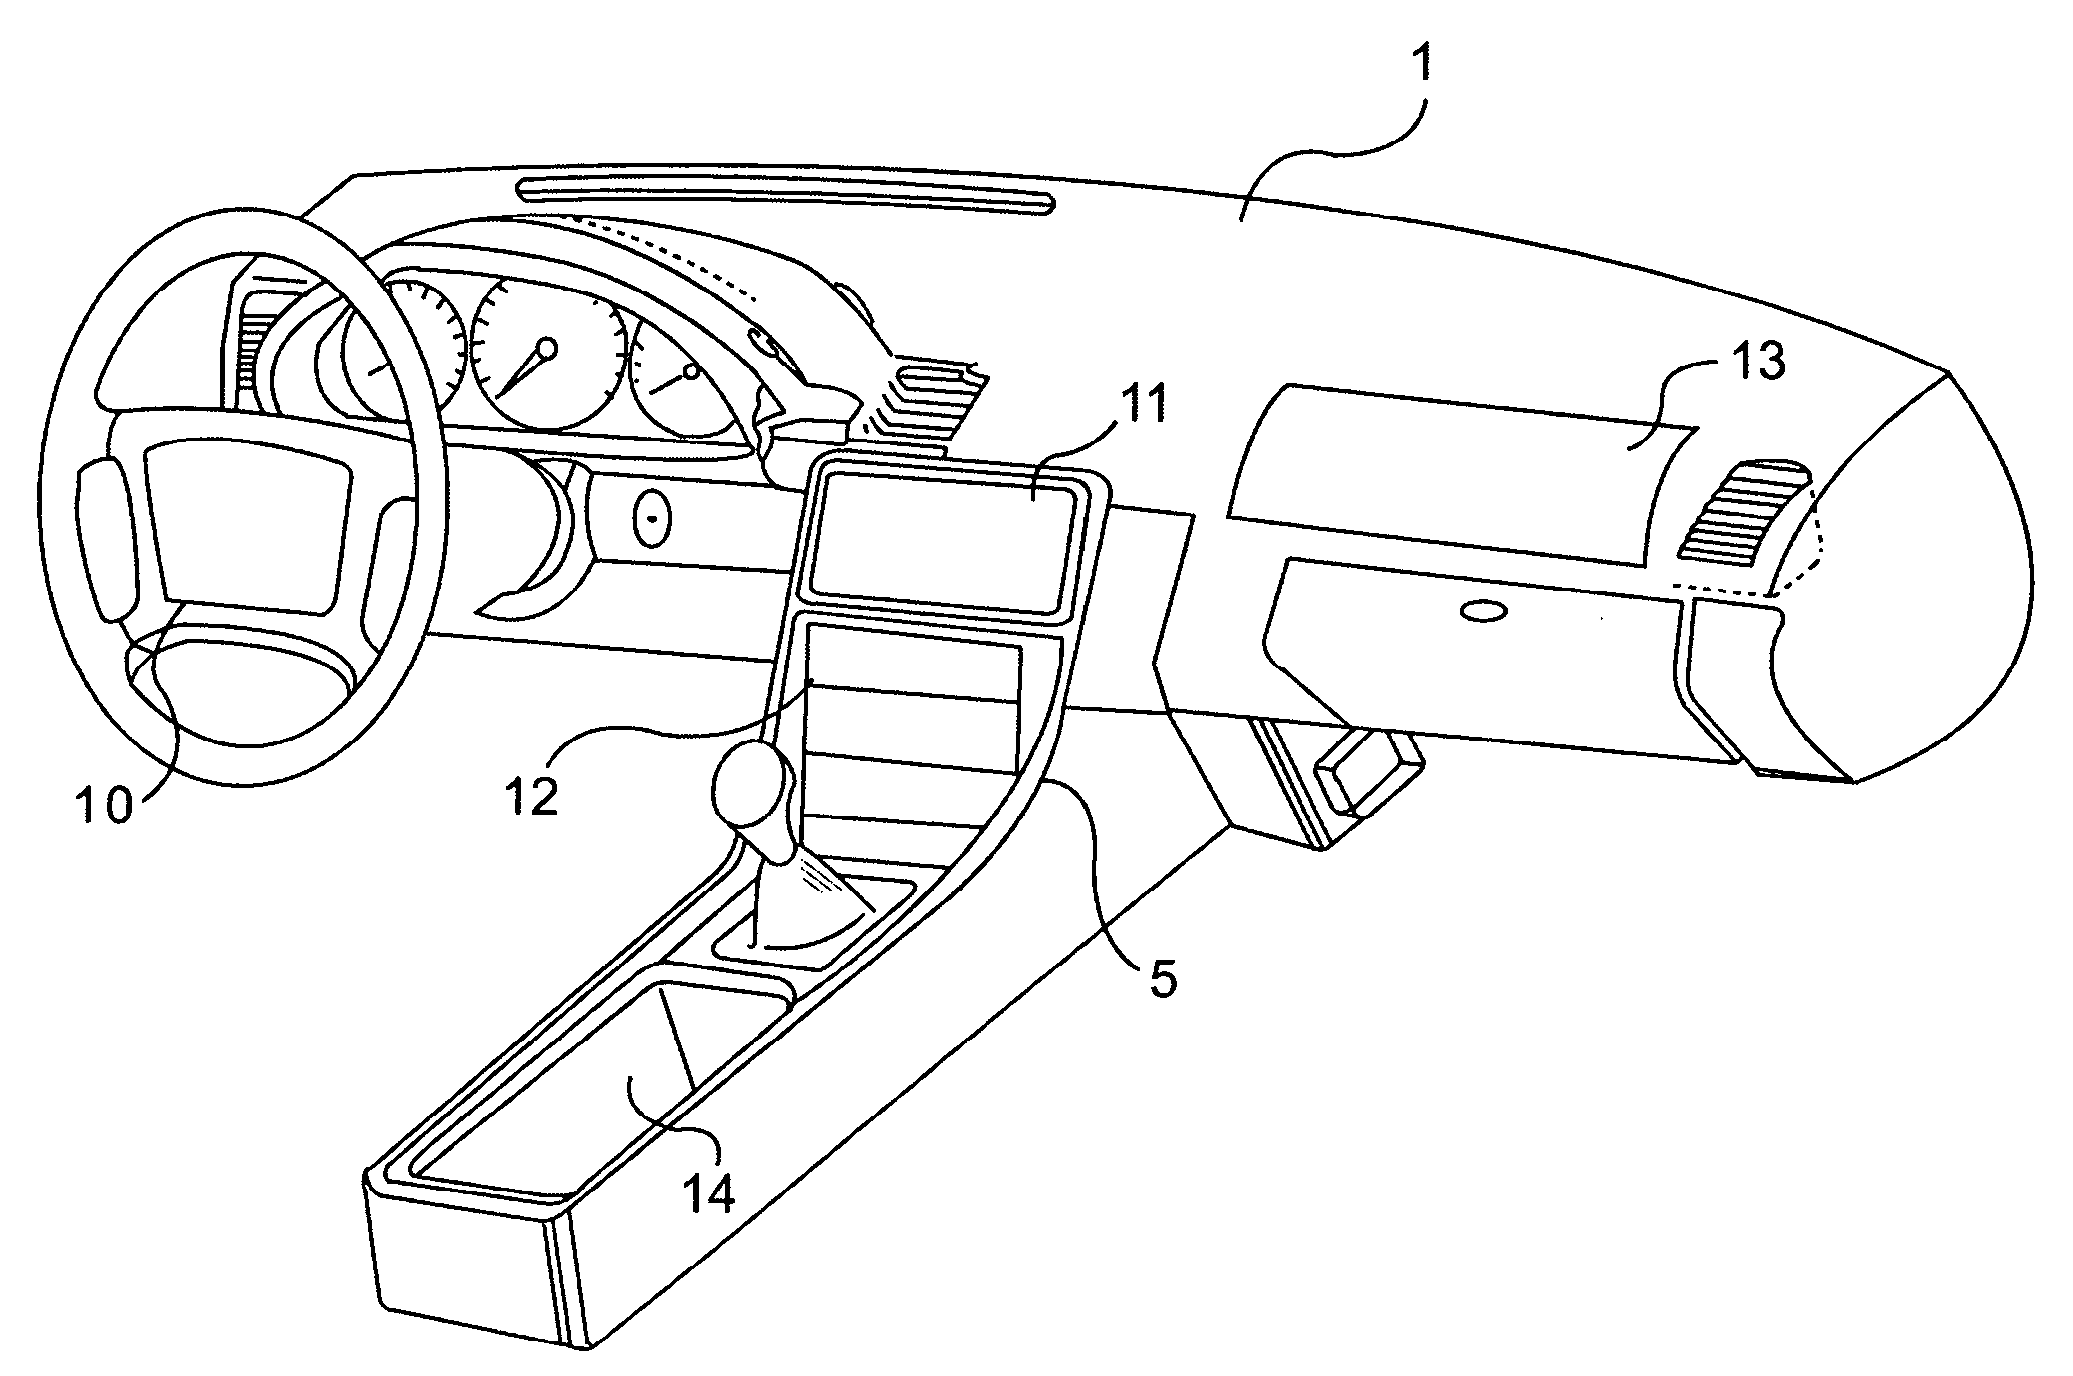 Drawing Of Car Dashboard